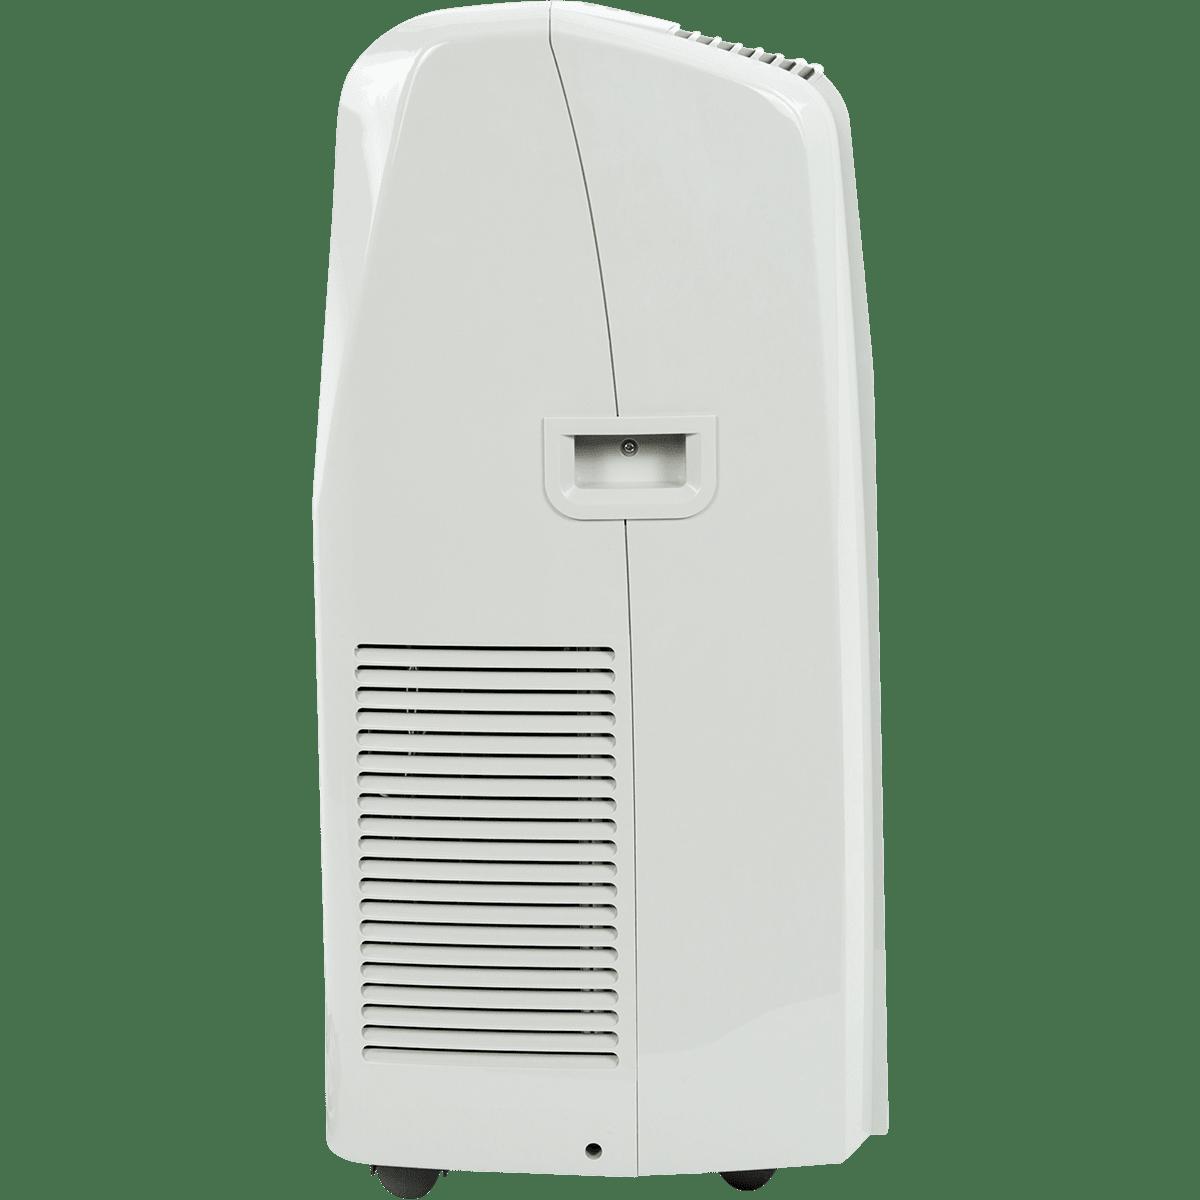 Delonghi Pinguino 14000 Btu Portable Air Conditioner Sylvane Fan Control Harbor Breeze 600 Watt Black 3 Speed Rotary Ceiling